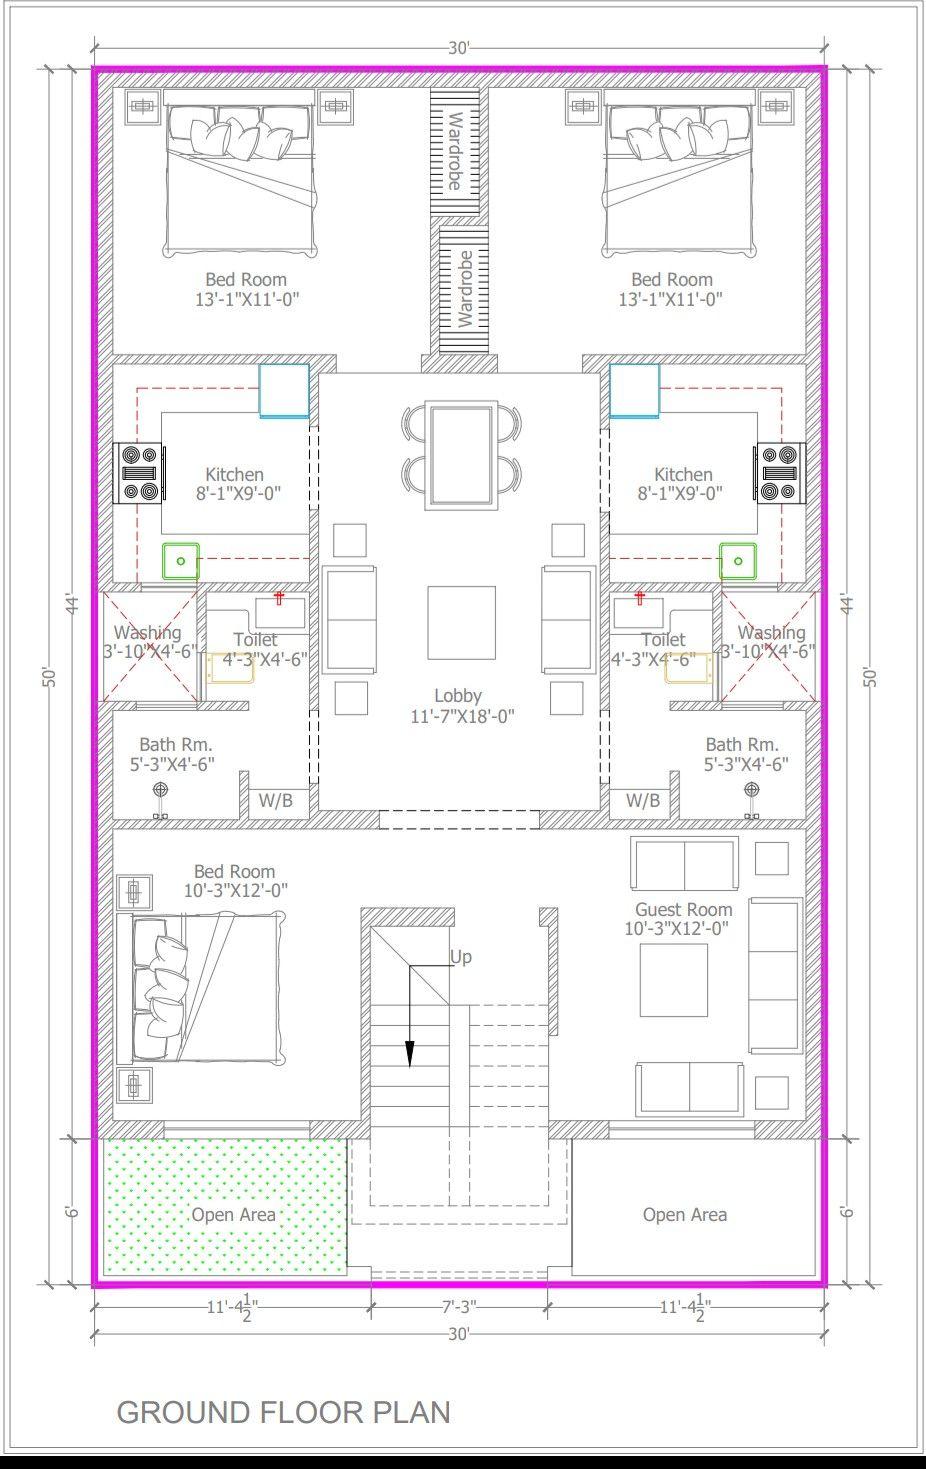 30x50 Bestie Floor Plan 3bhk Guest Room 2seprate Kitchen Client Praposal House Map Family House Plans Home Map Design